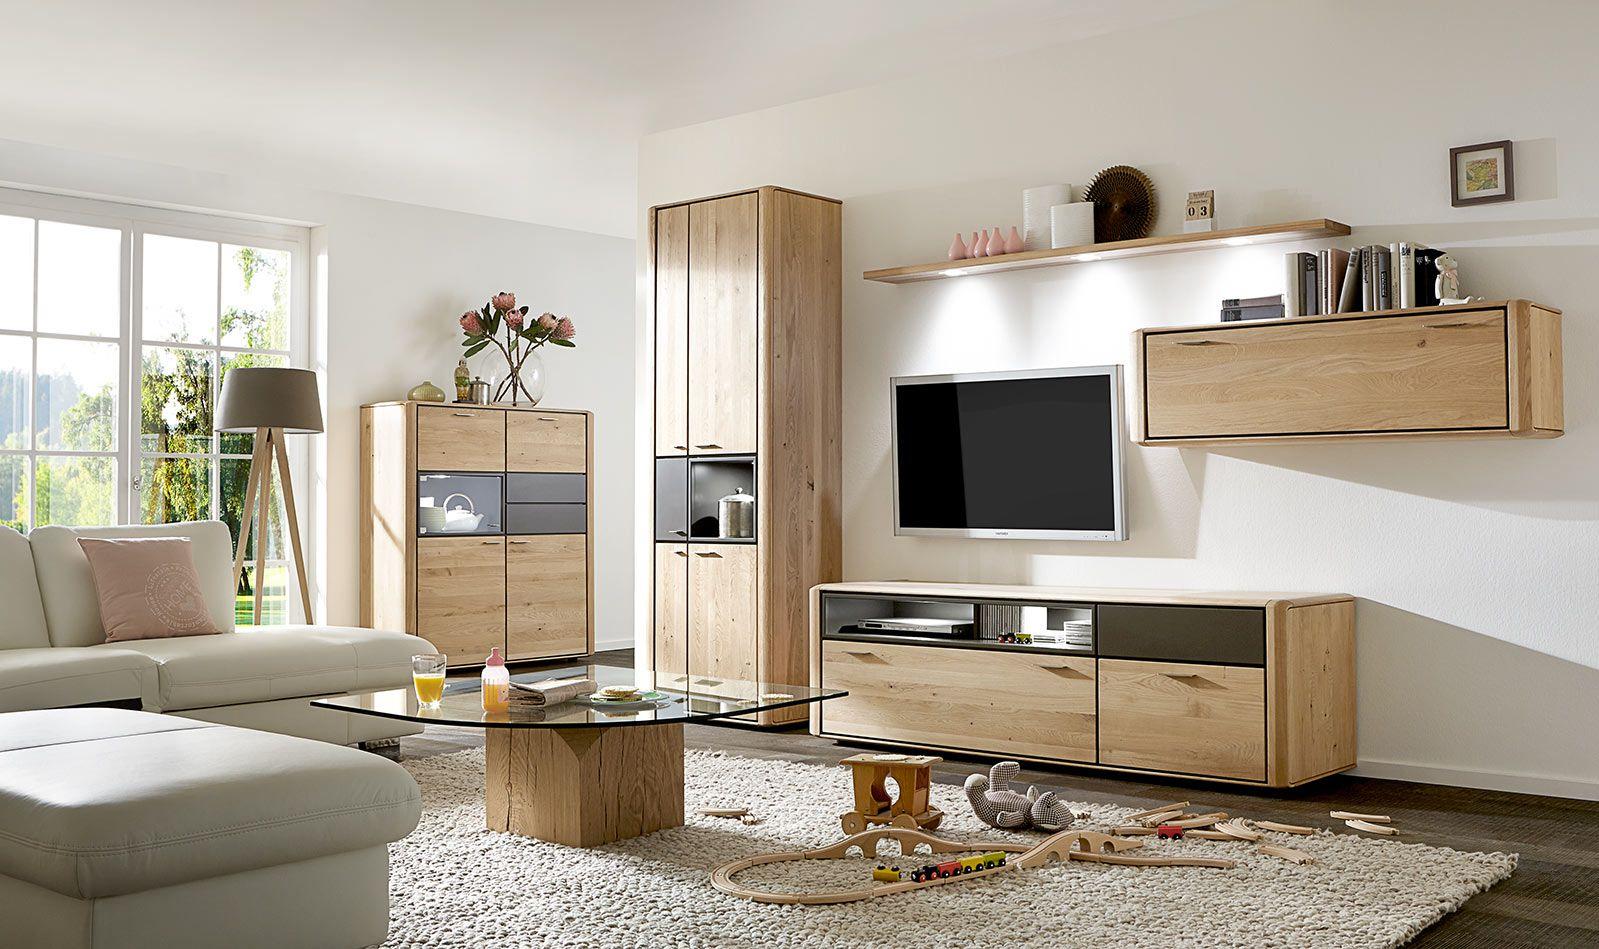 emilio - Ranges - Living Rooms - Venjakob Möbel | Modular Euro ...